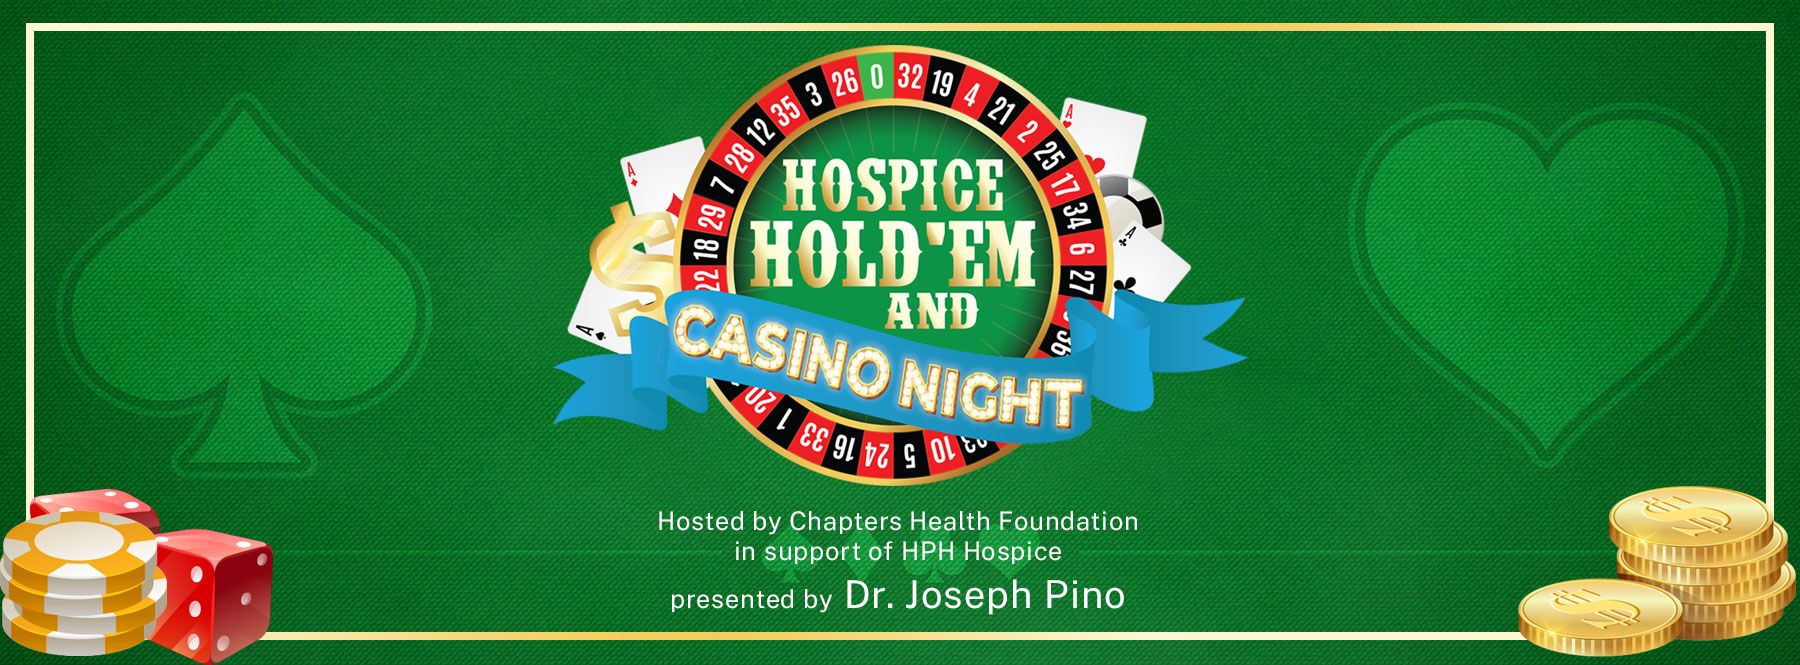 Hospice Hold'Em and Casino Night